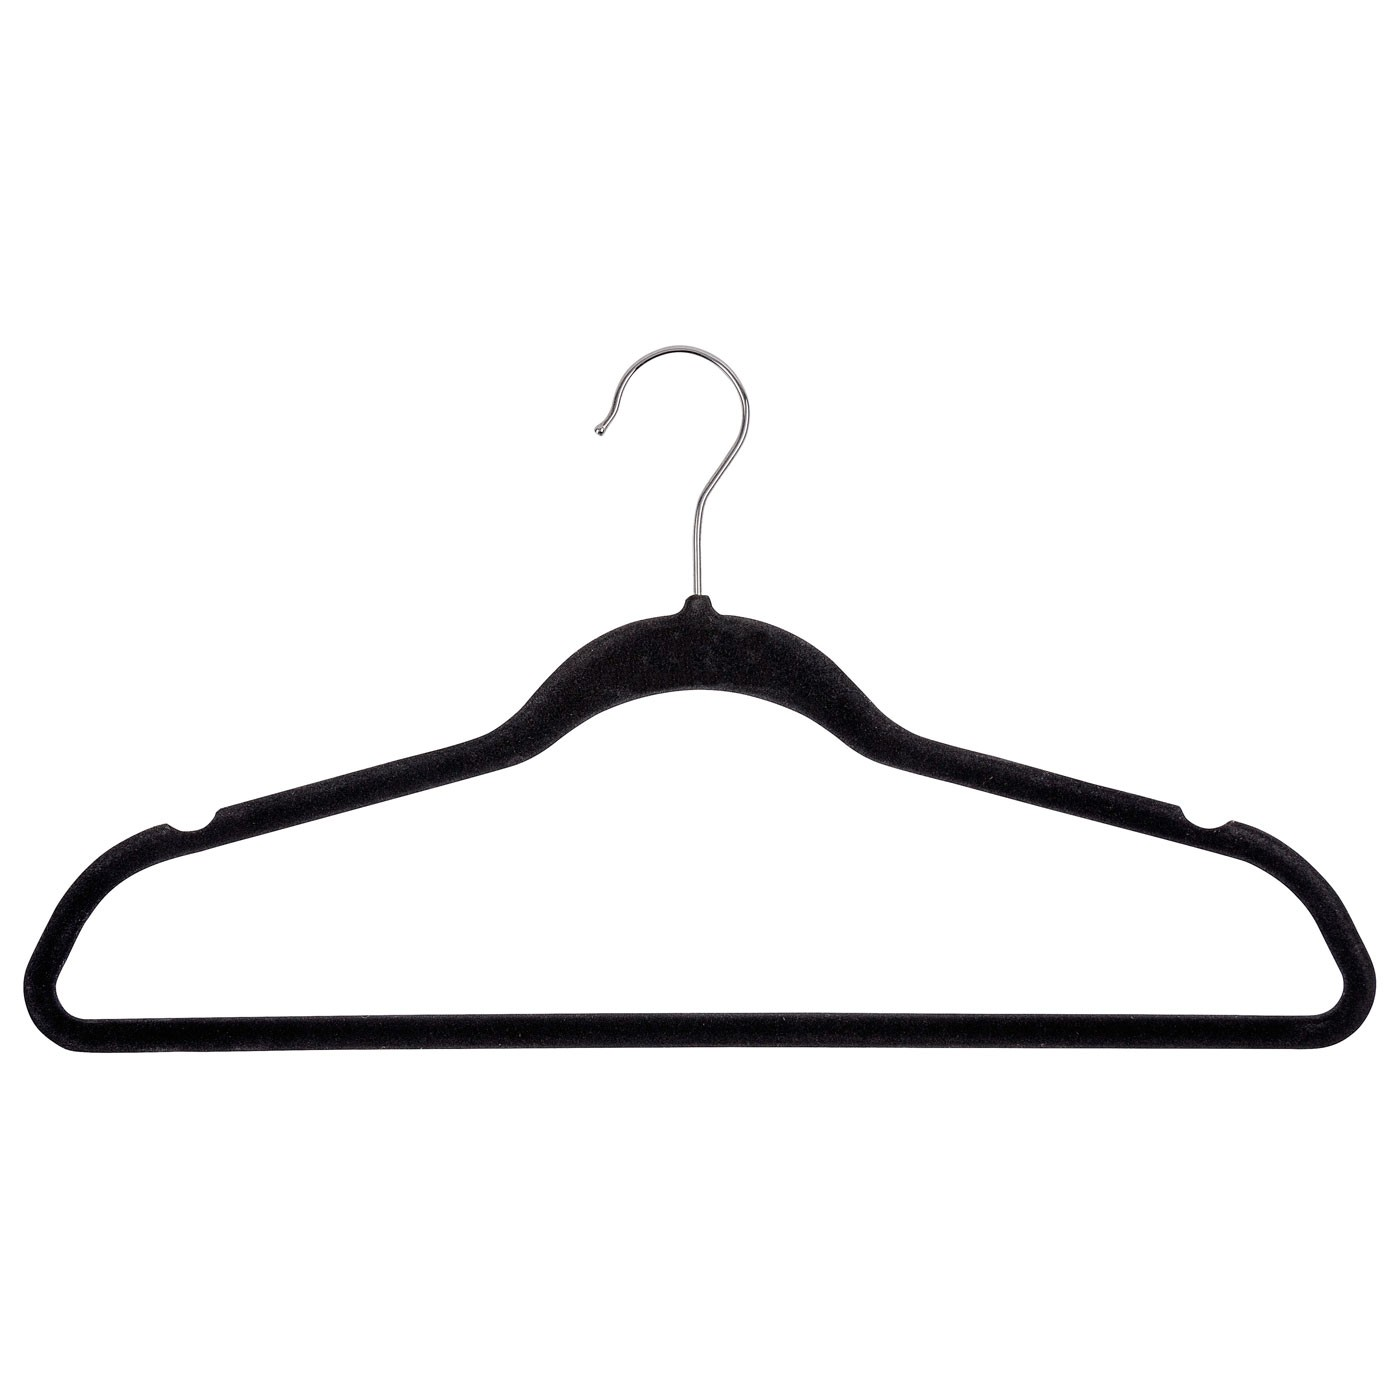 Kleiderbügel Beflockt kleiderbügel beflockt schwarz